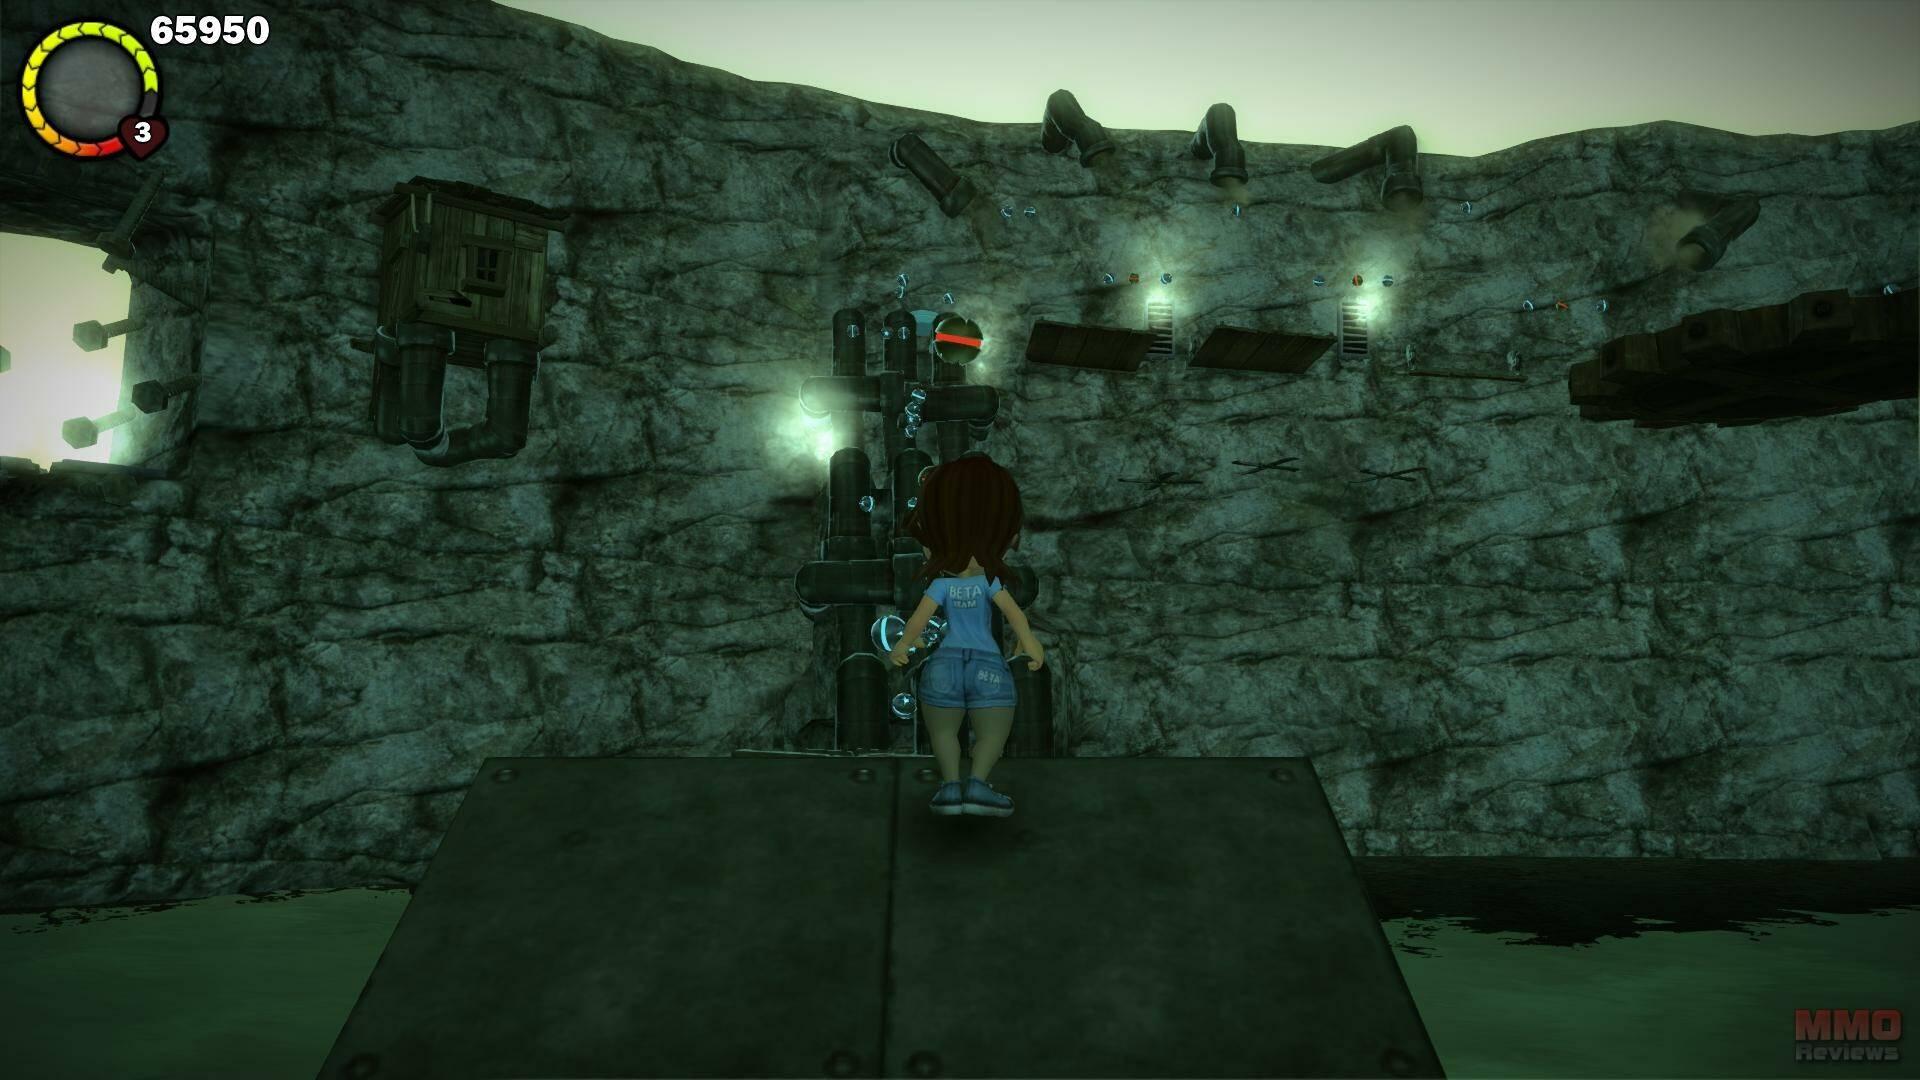 Imagenes de Gameglobe